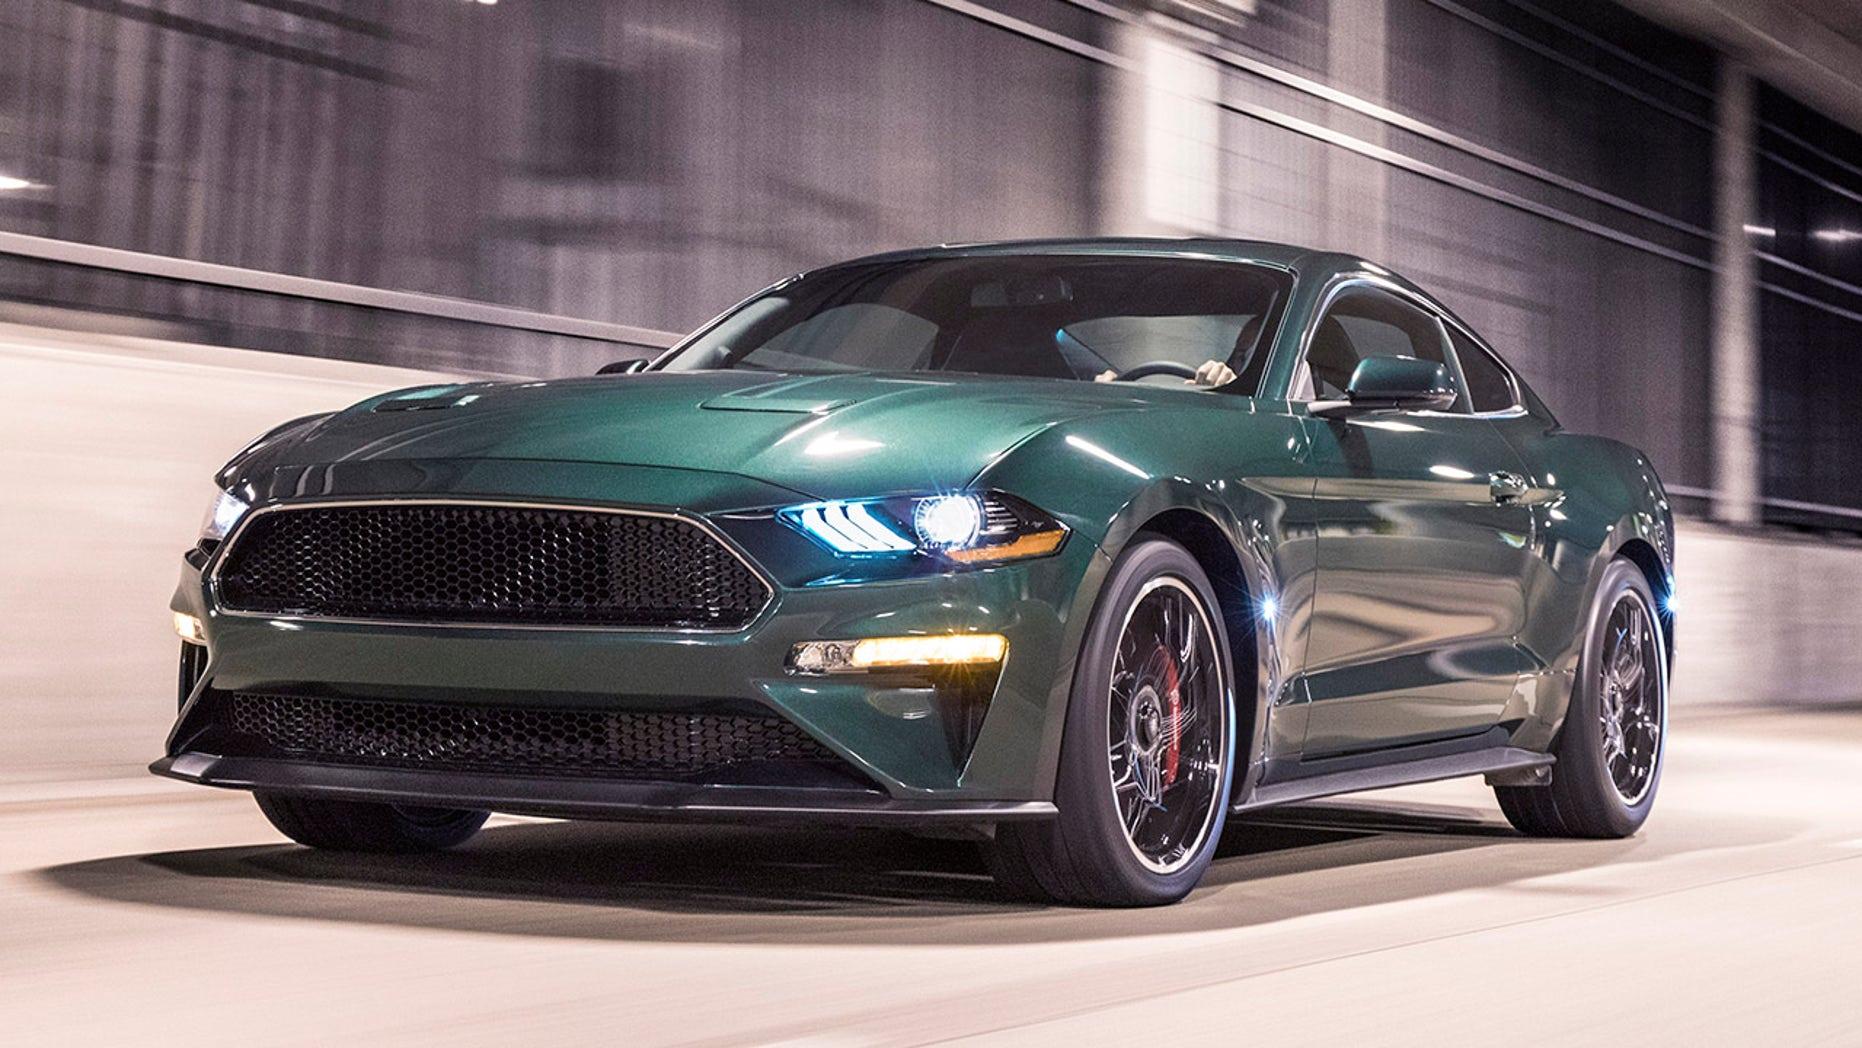 2019 Bullitt Ford Mustang GT